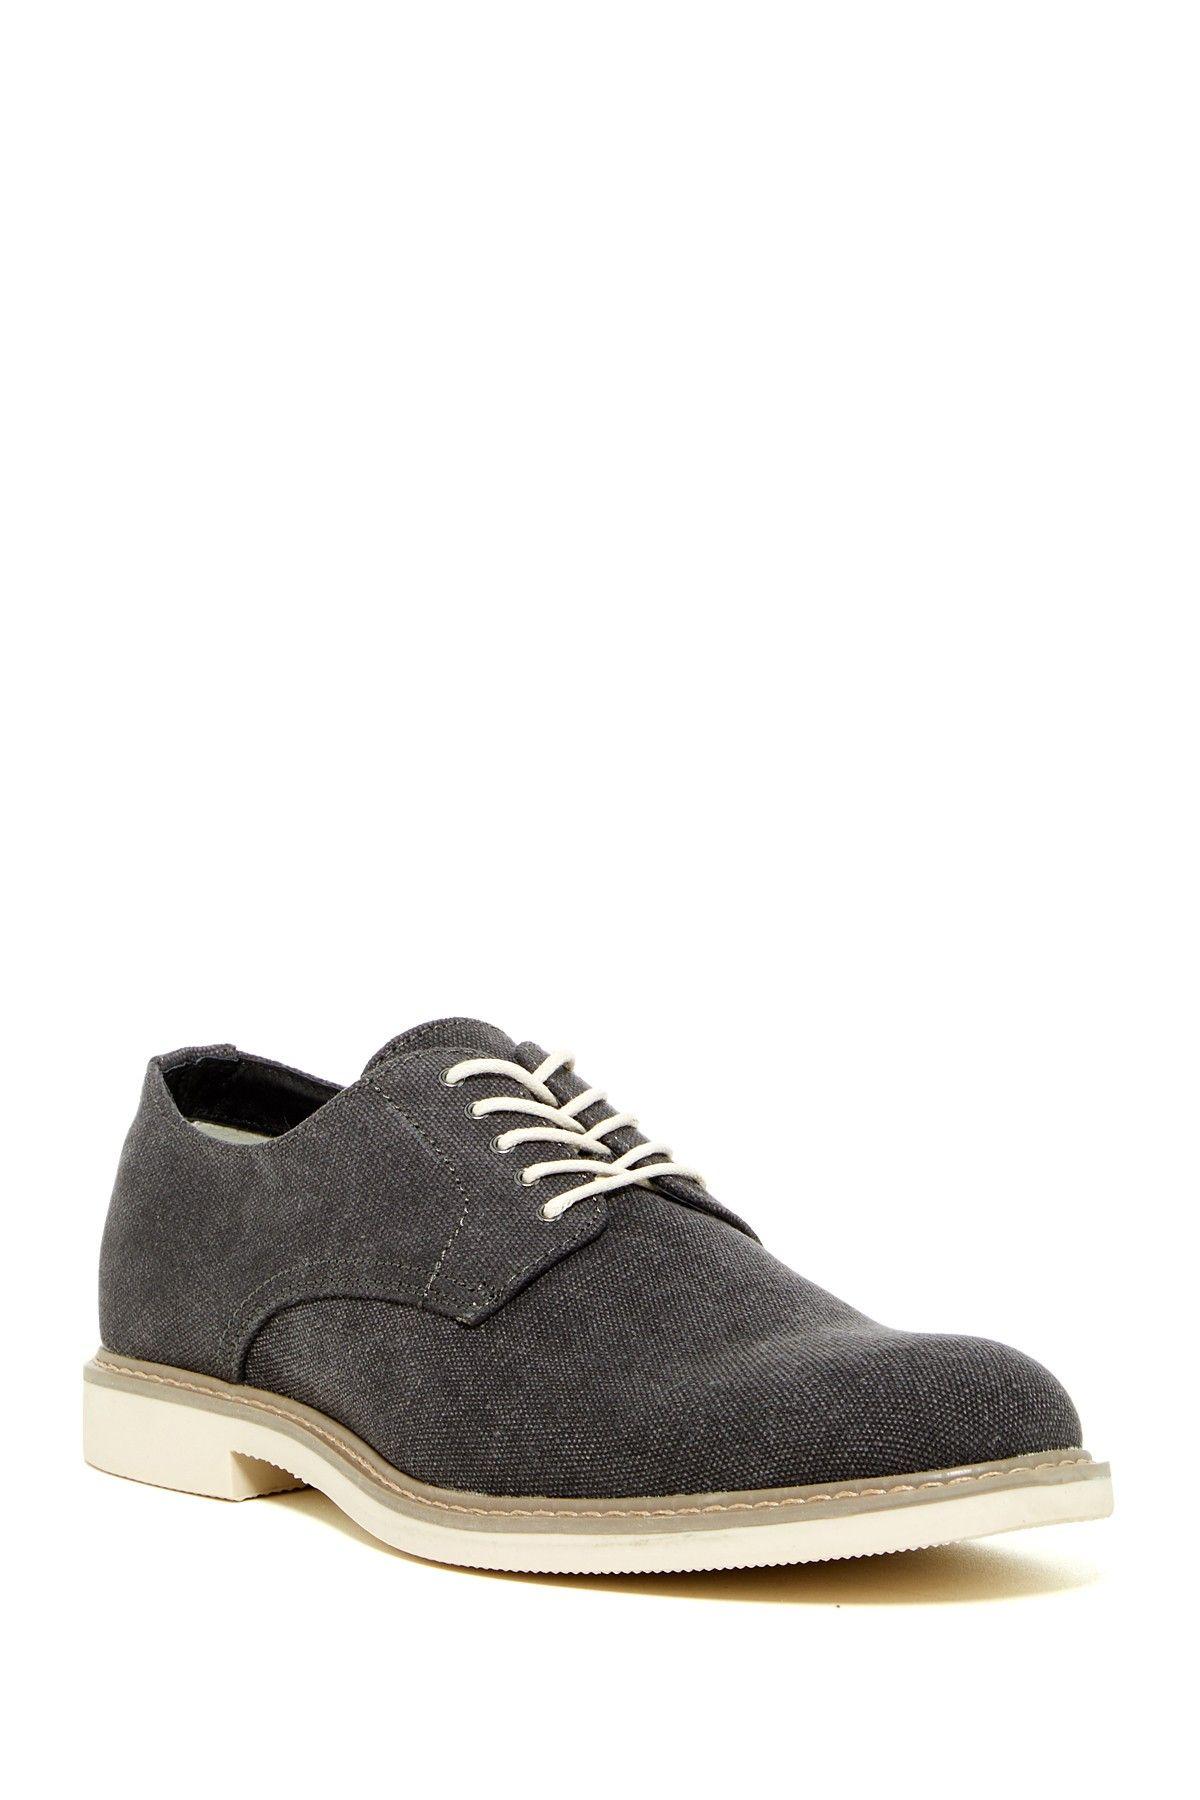 d8dac9197ff Public Opinion | Zane Canvas Derby | Non Leather Men's Shoes ...